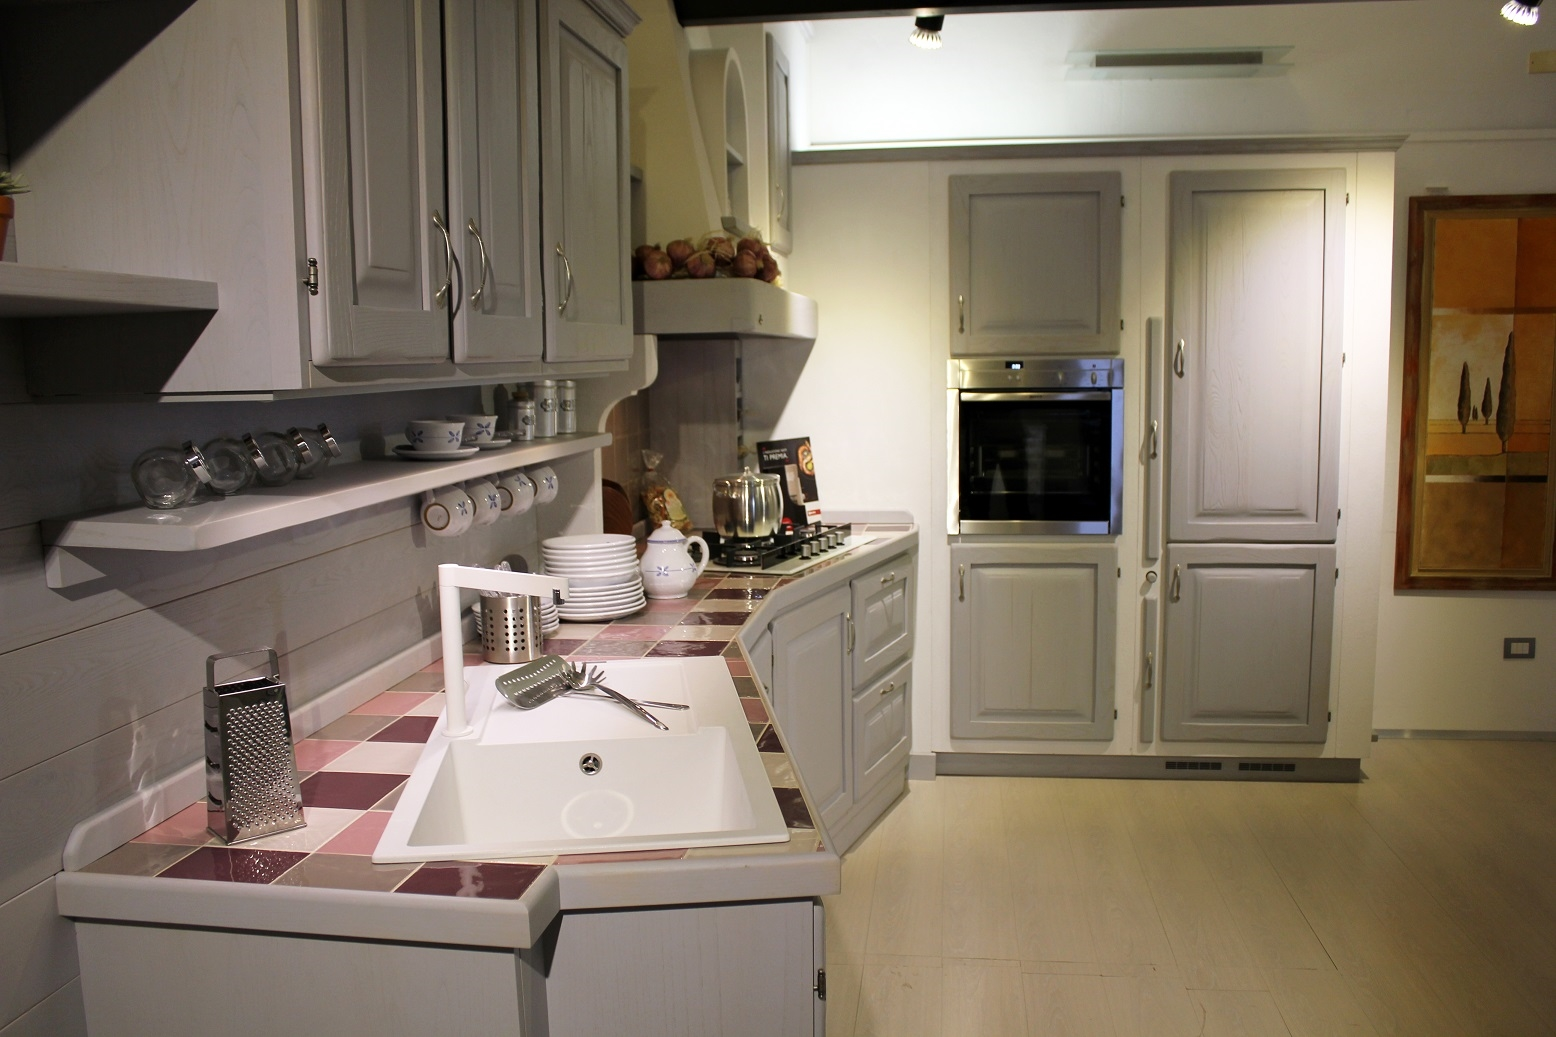 Cucine Gas Franke. Franke Kitchen System Leader Mondiale Nella ...